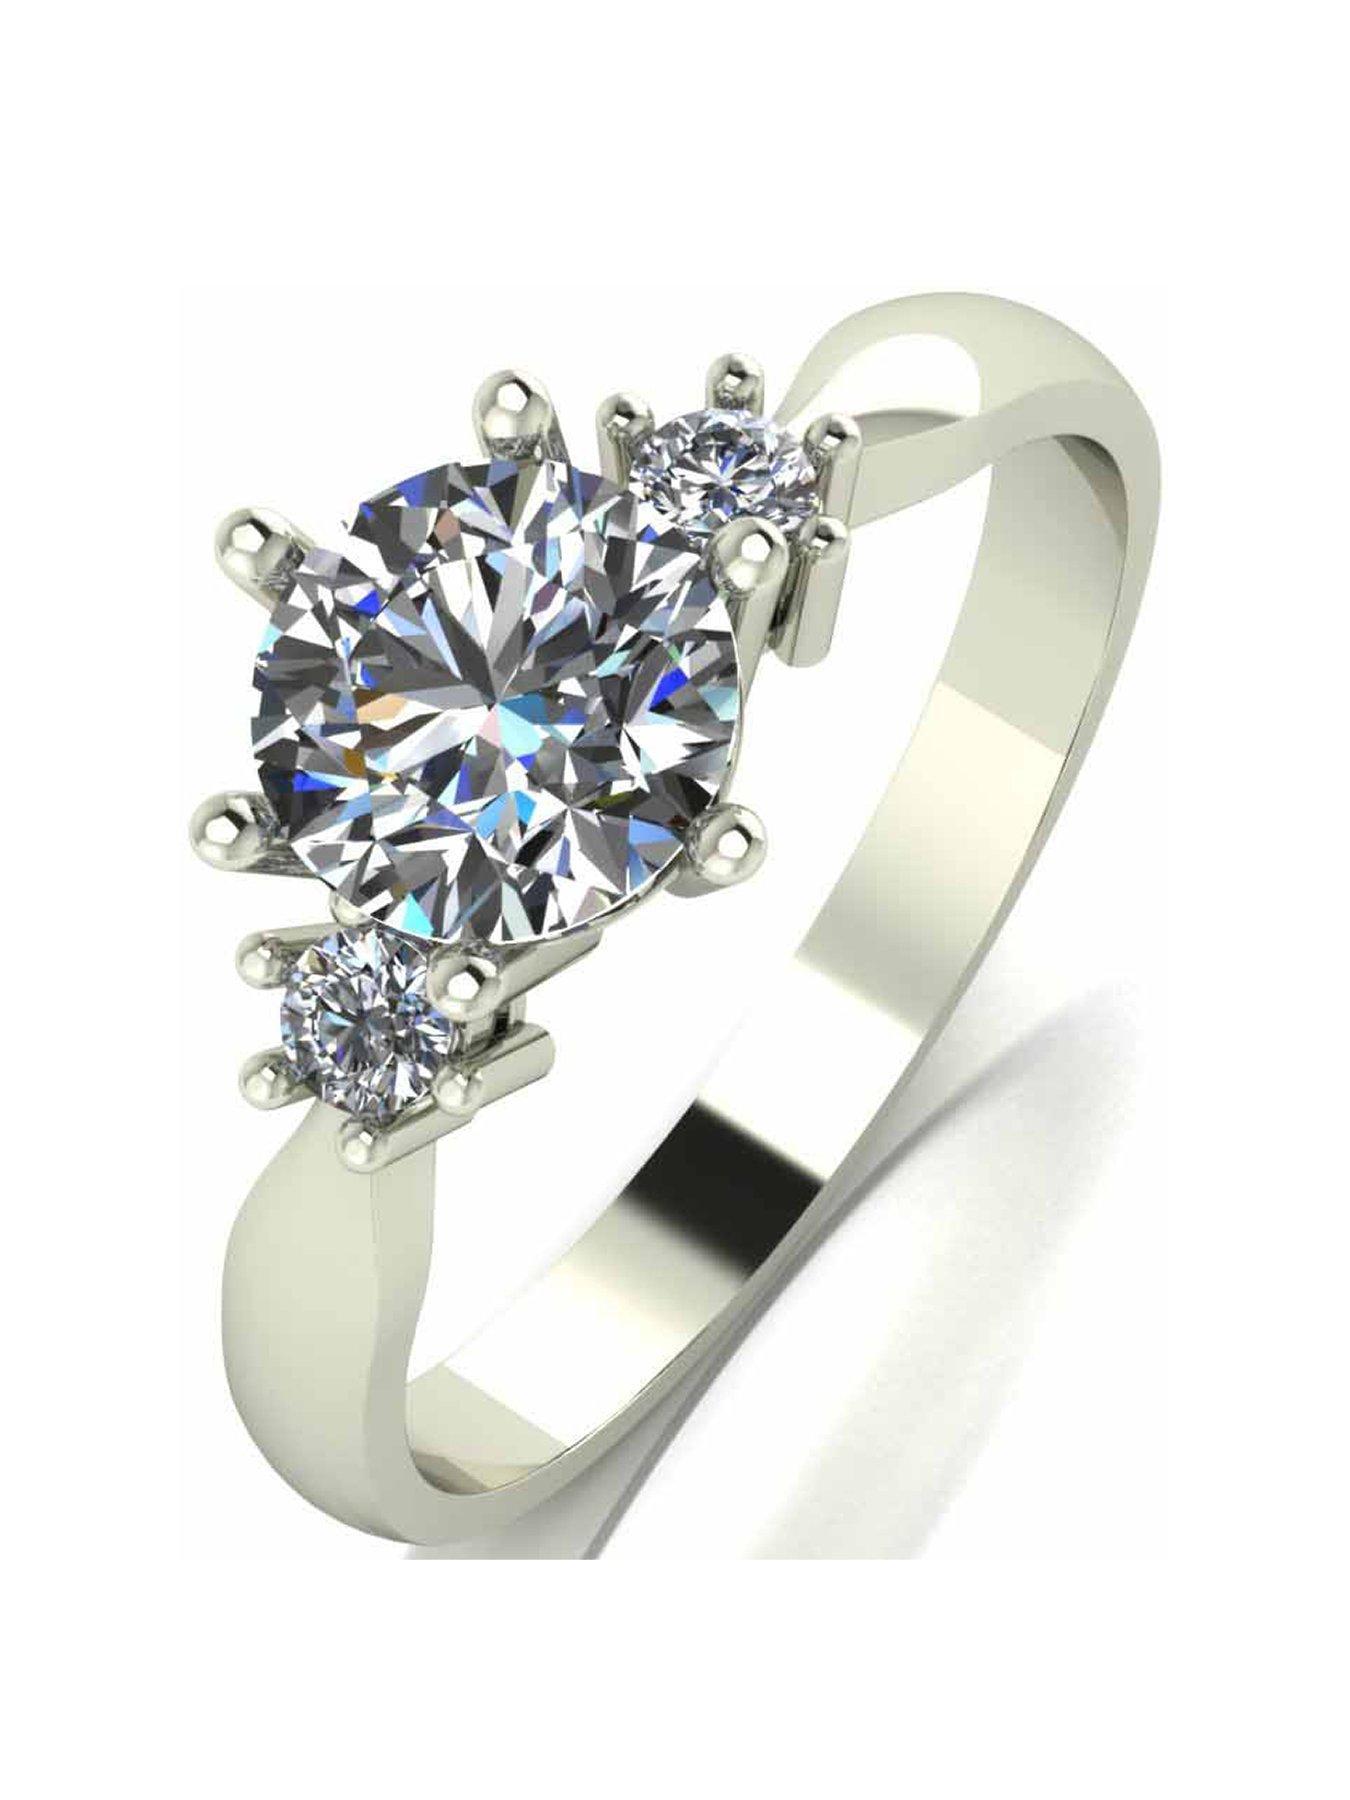 1ct Diamond Solitaire Engagement Princess Shoulder Set Ring 9ct Gold Size I-P UK